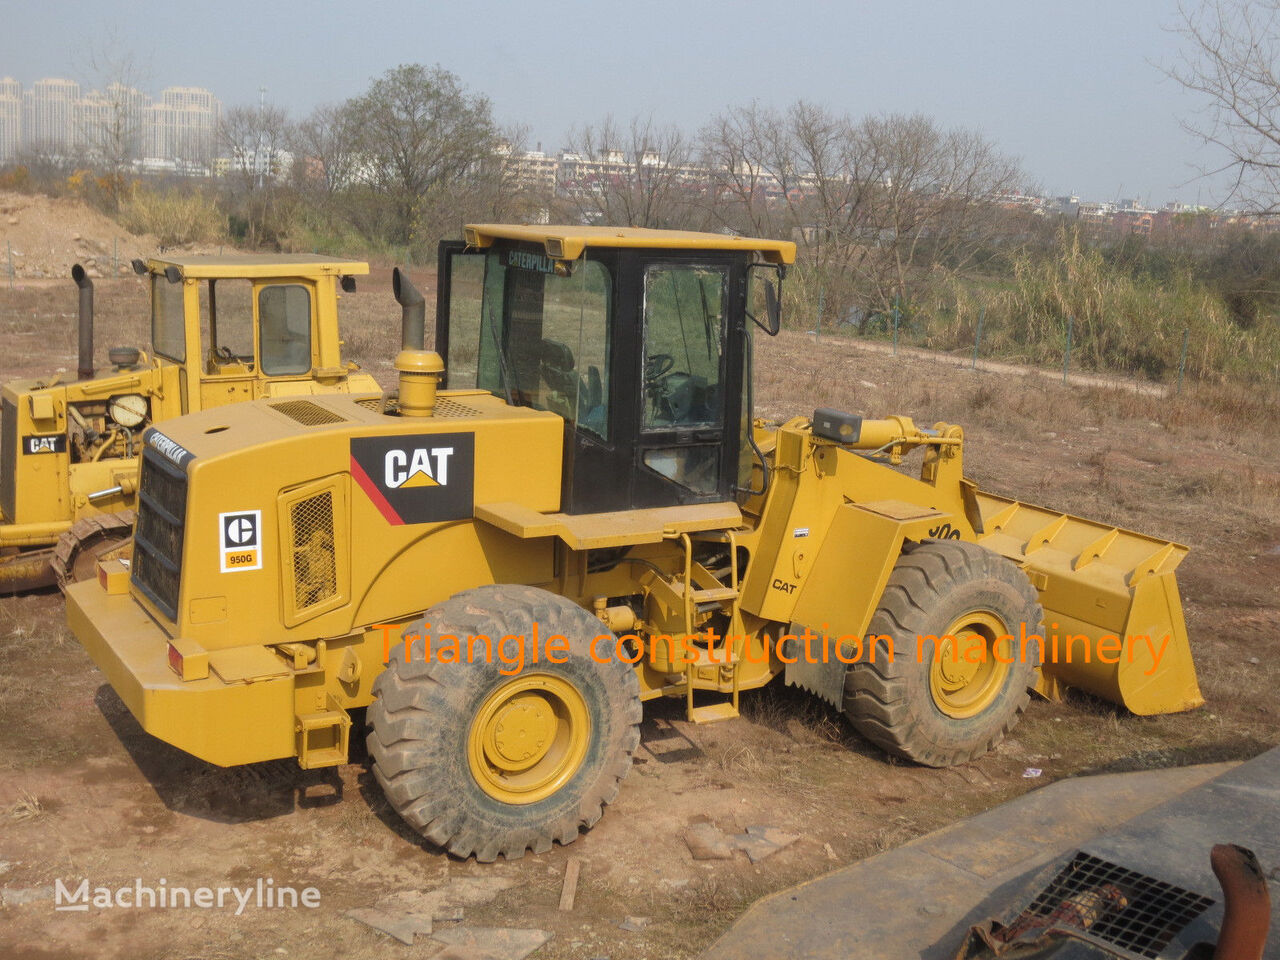 CATERPILLAR 950G wheel loader